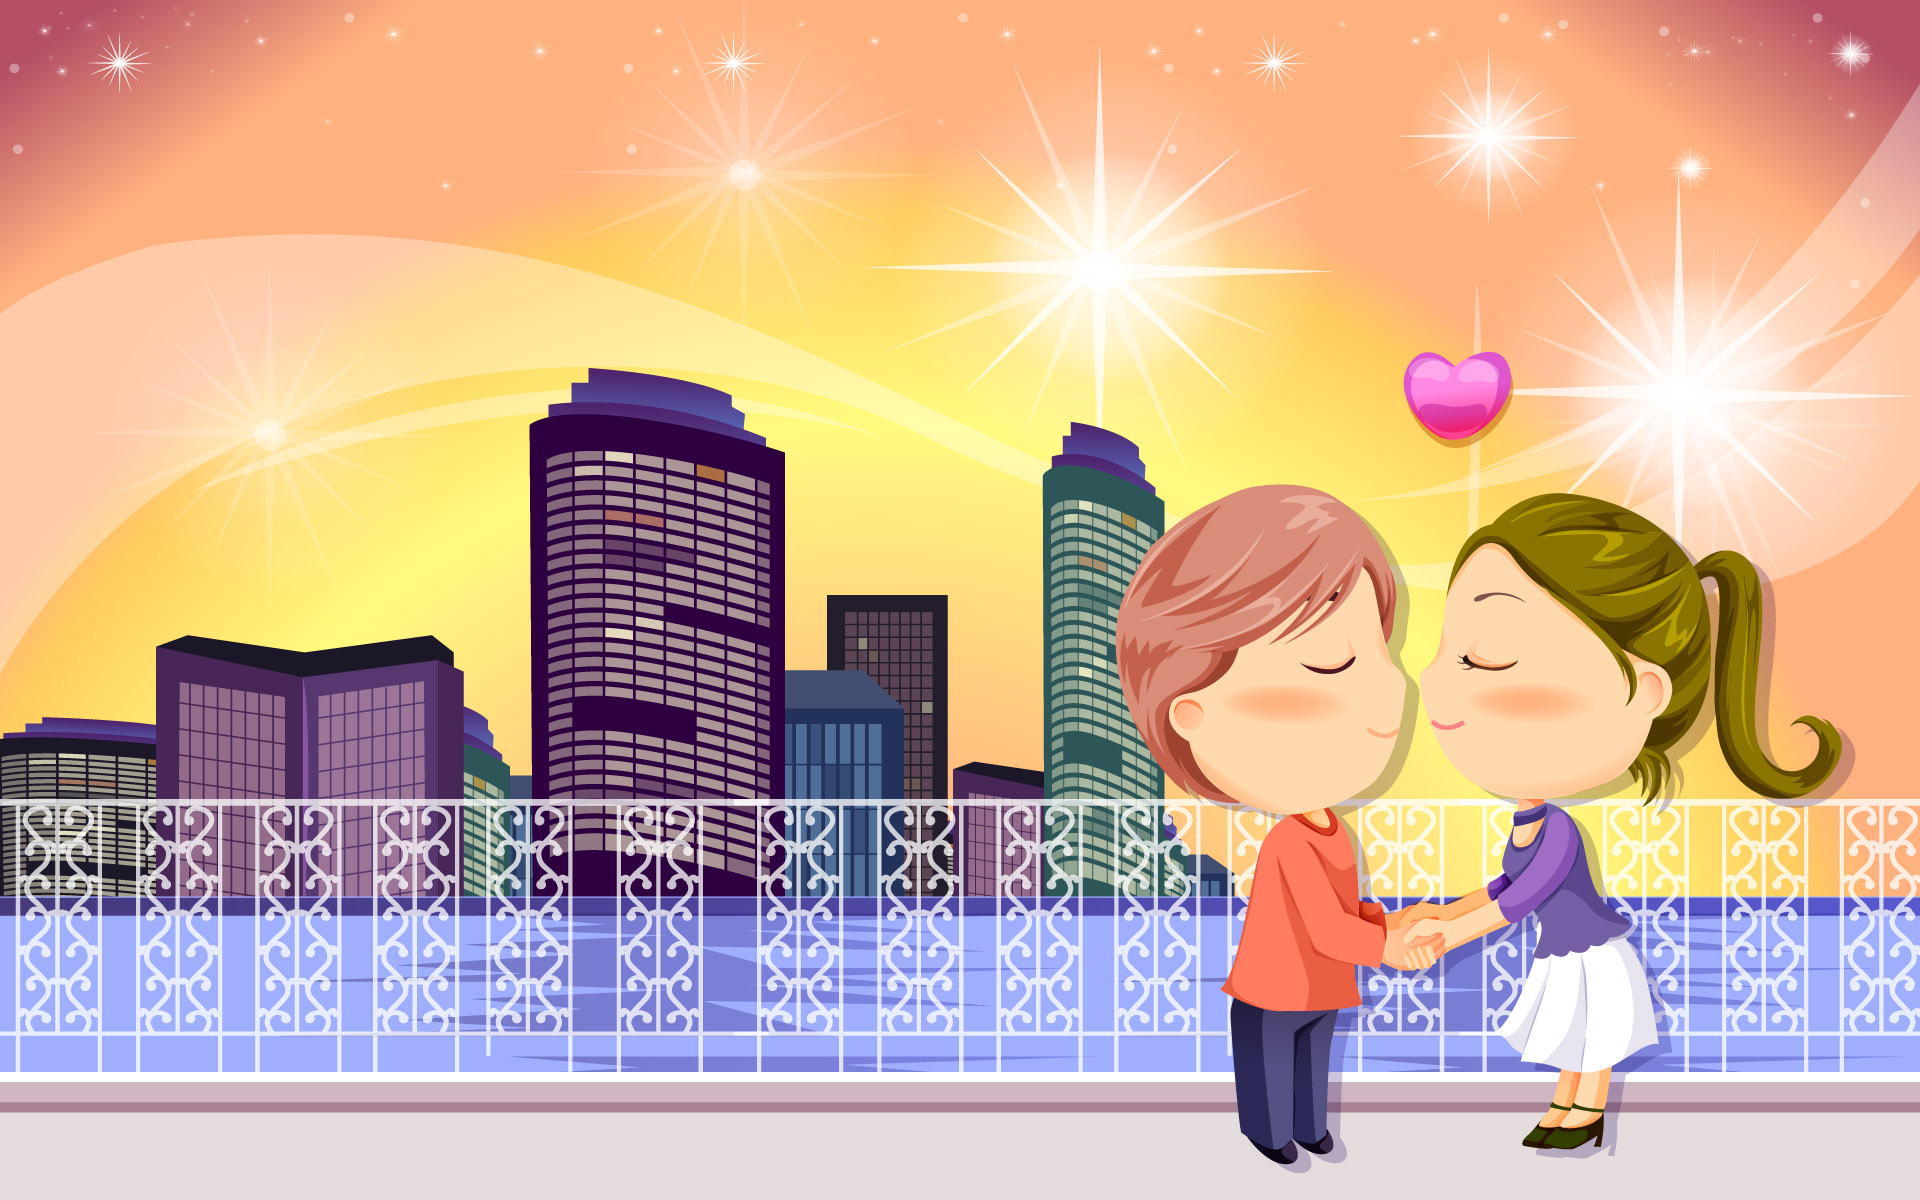 Adorable Love Wallpaper Romantic Cartoon Pic New Hd